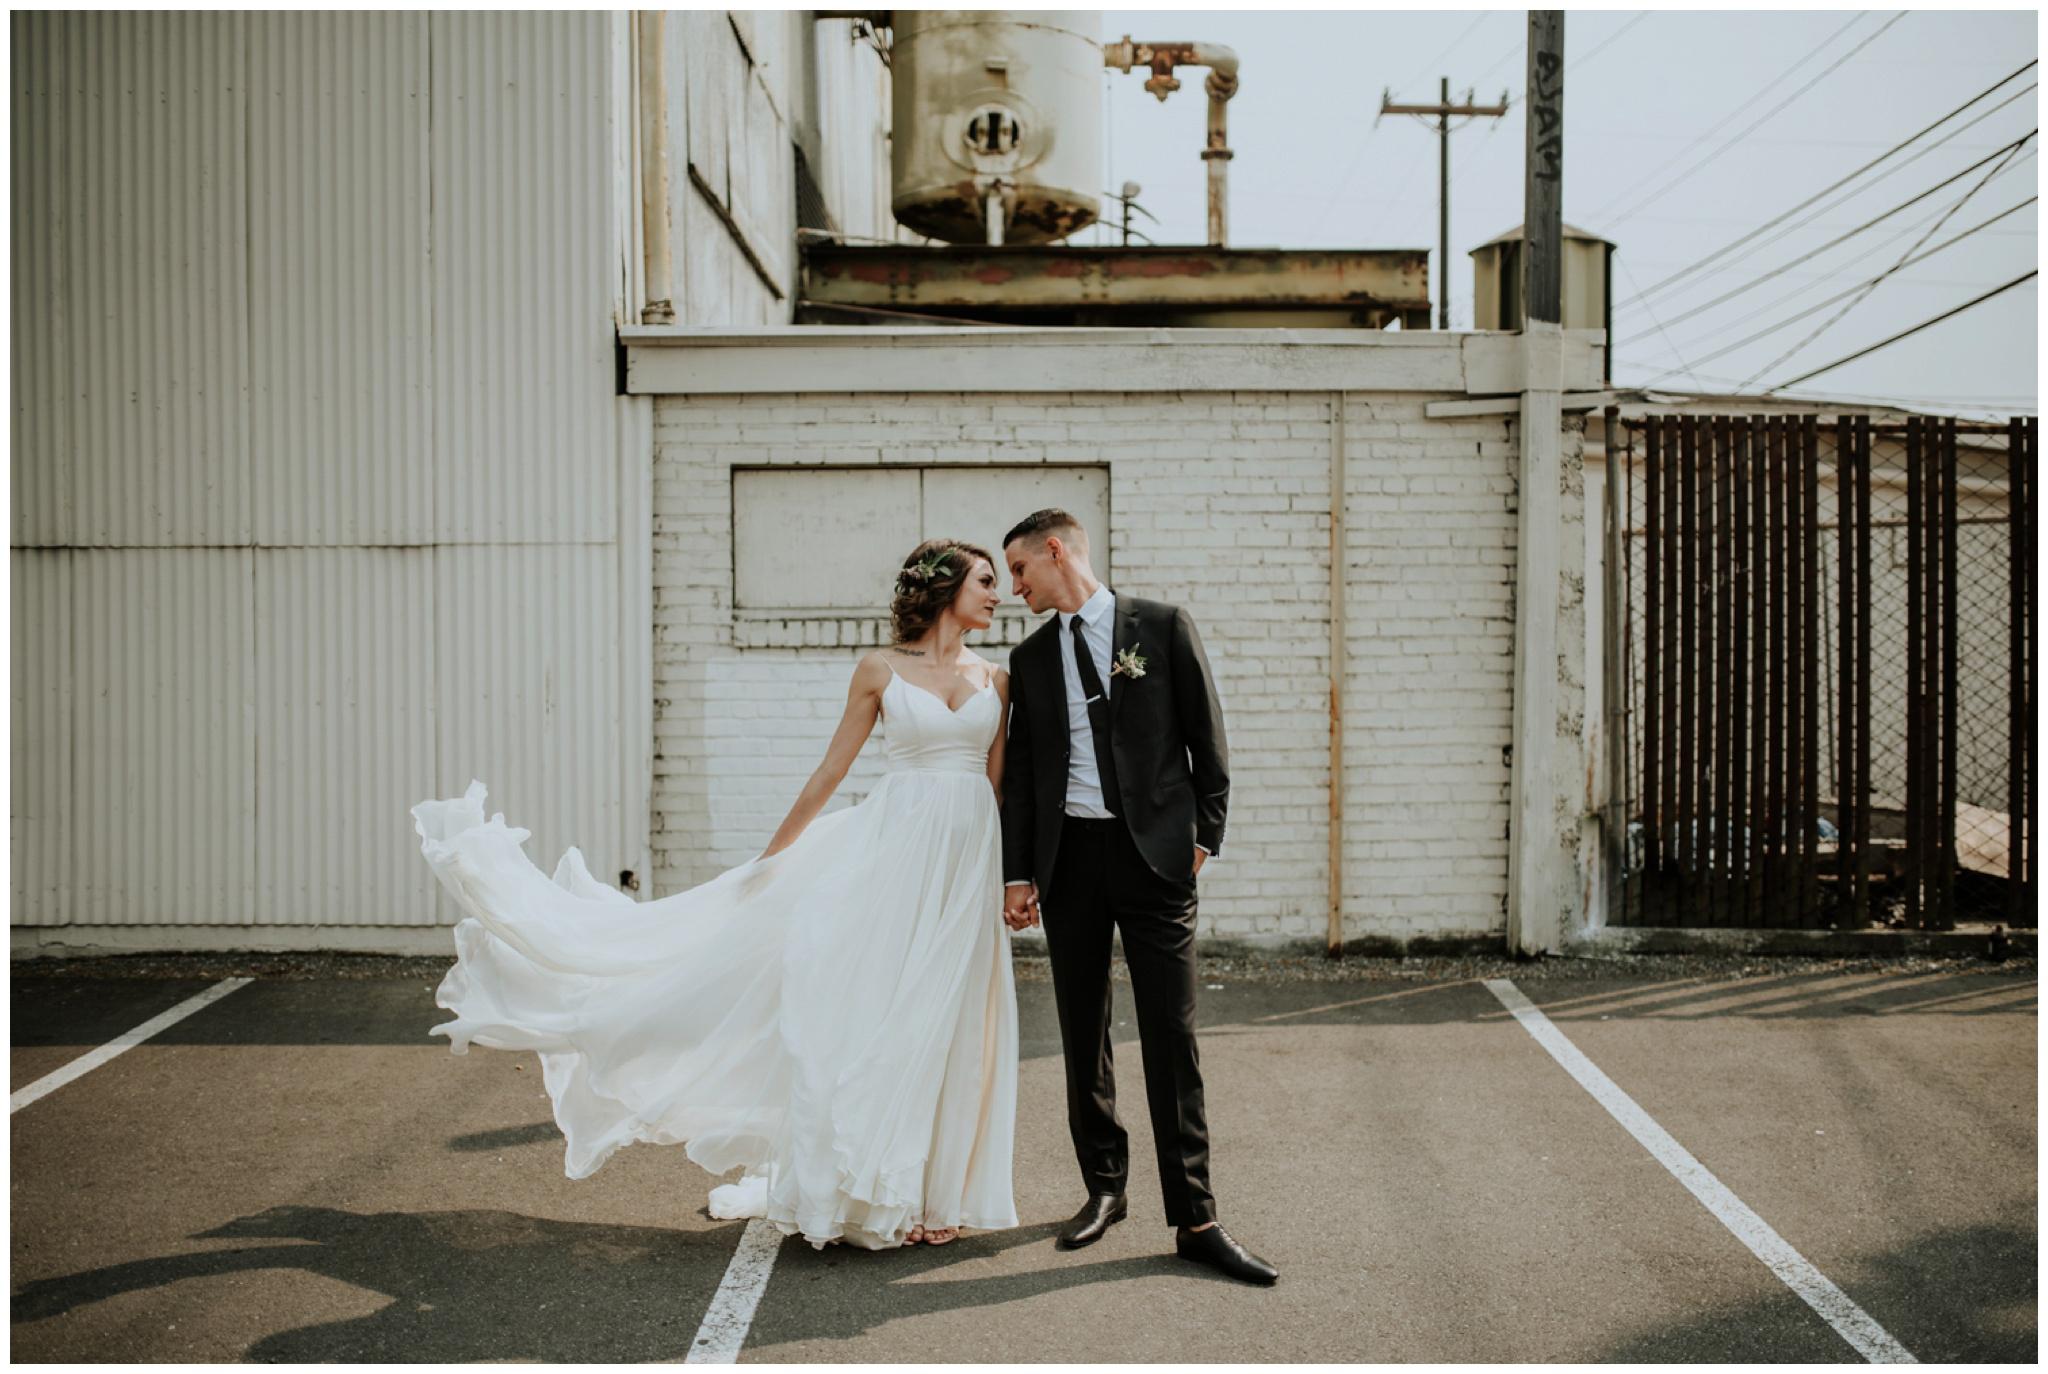 alyssa-keiran-westland-distillery-urban-seattle-wedding-photographer-caitlyn-nikula-77.jpg